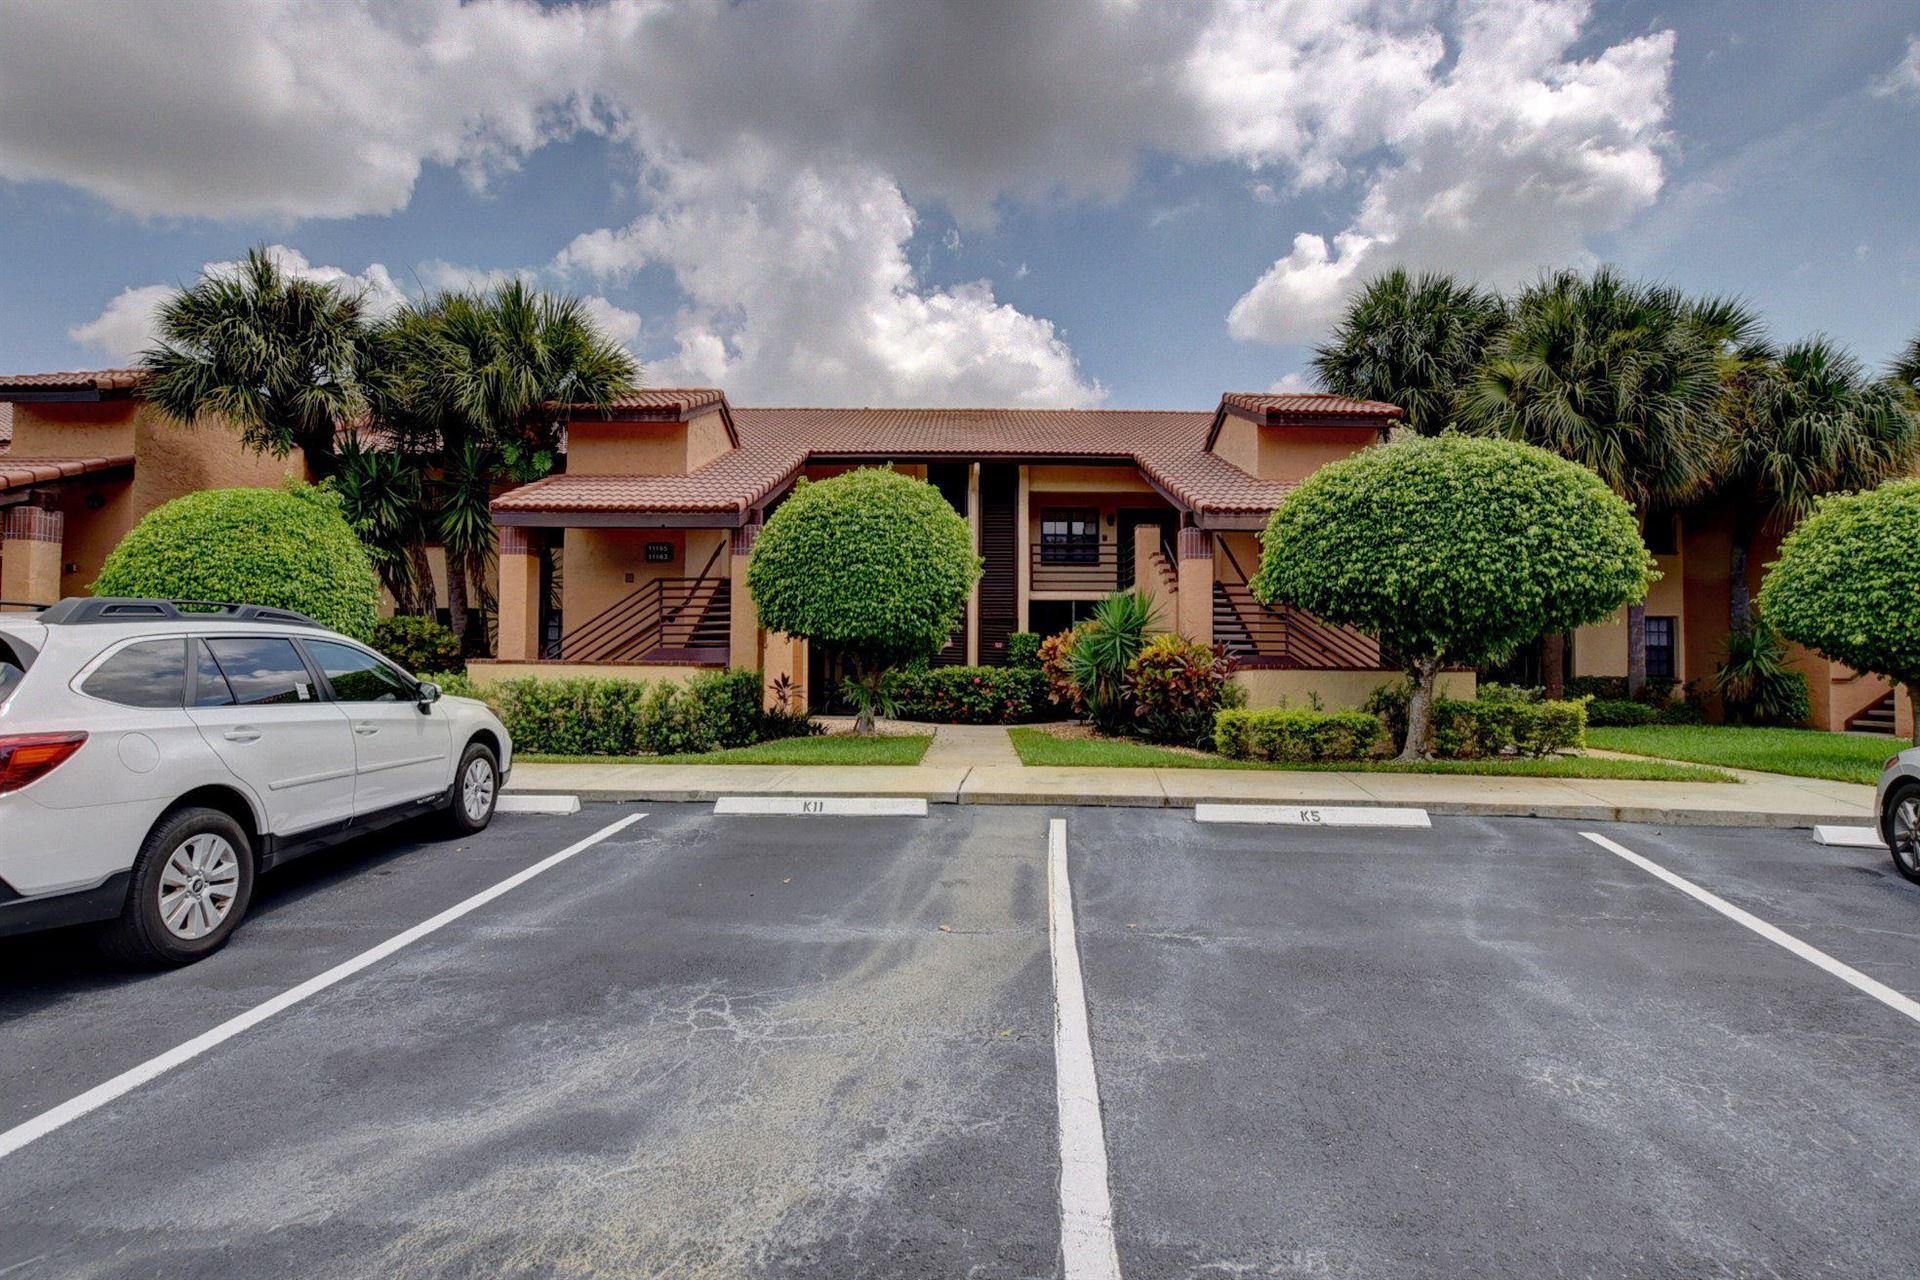 11179 Aspen Glen Drive, Boynton Beach, FL 33437 - #: RX-10640744